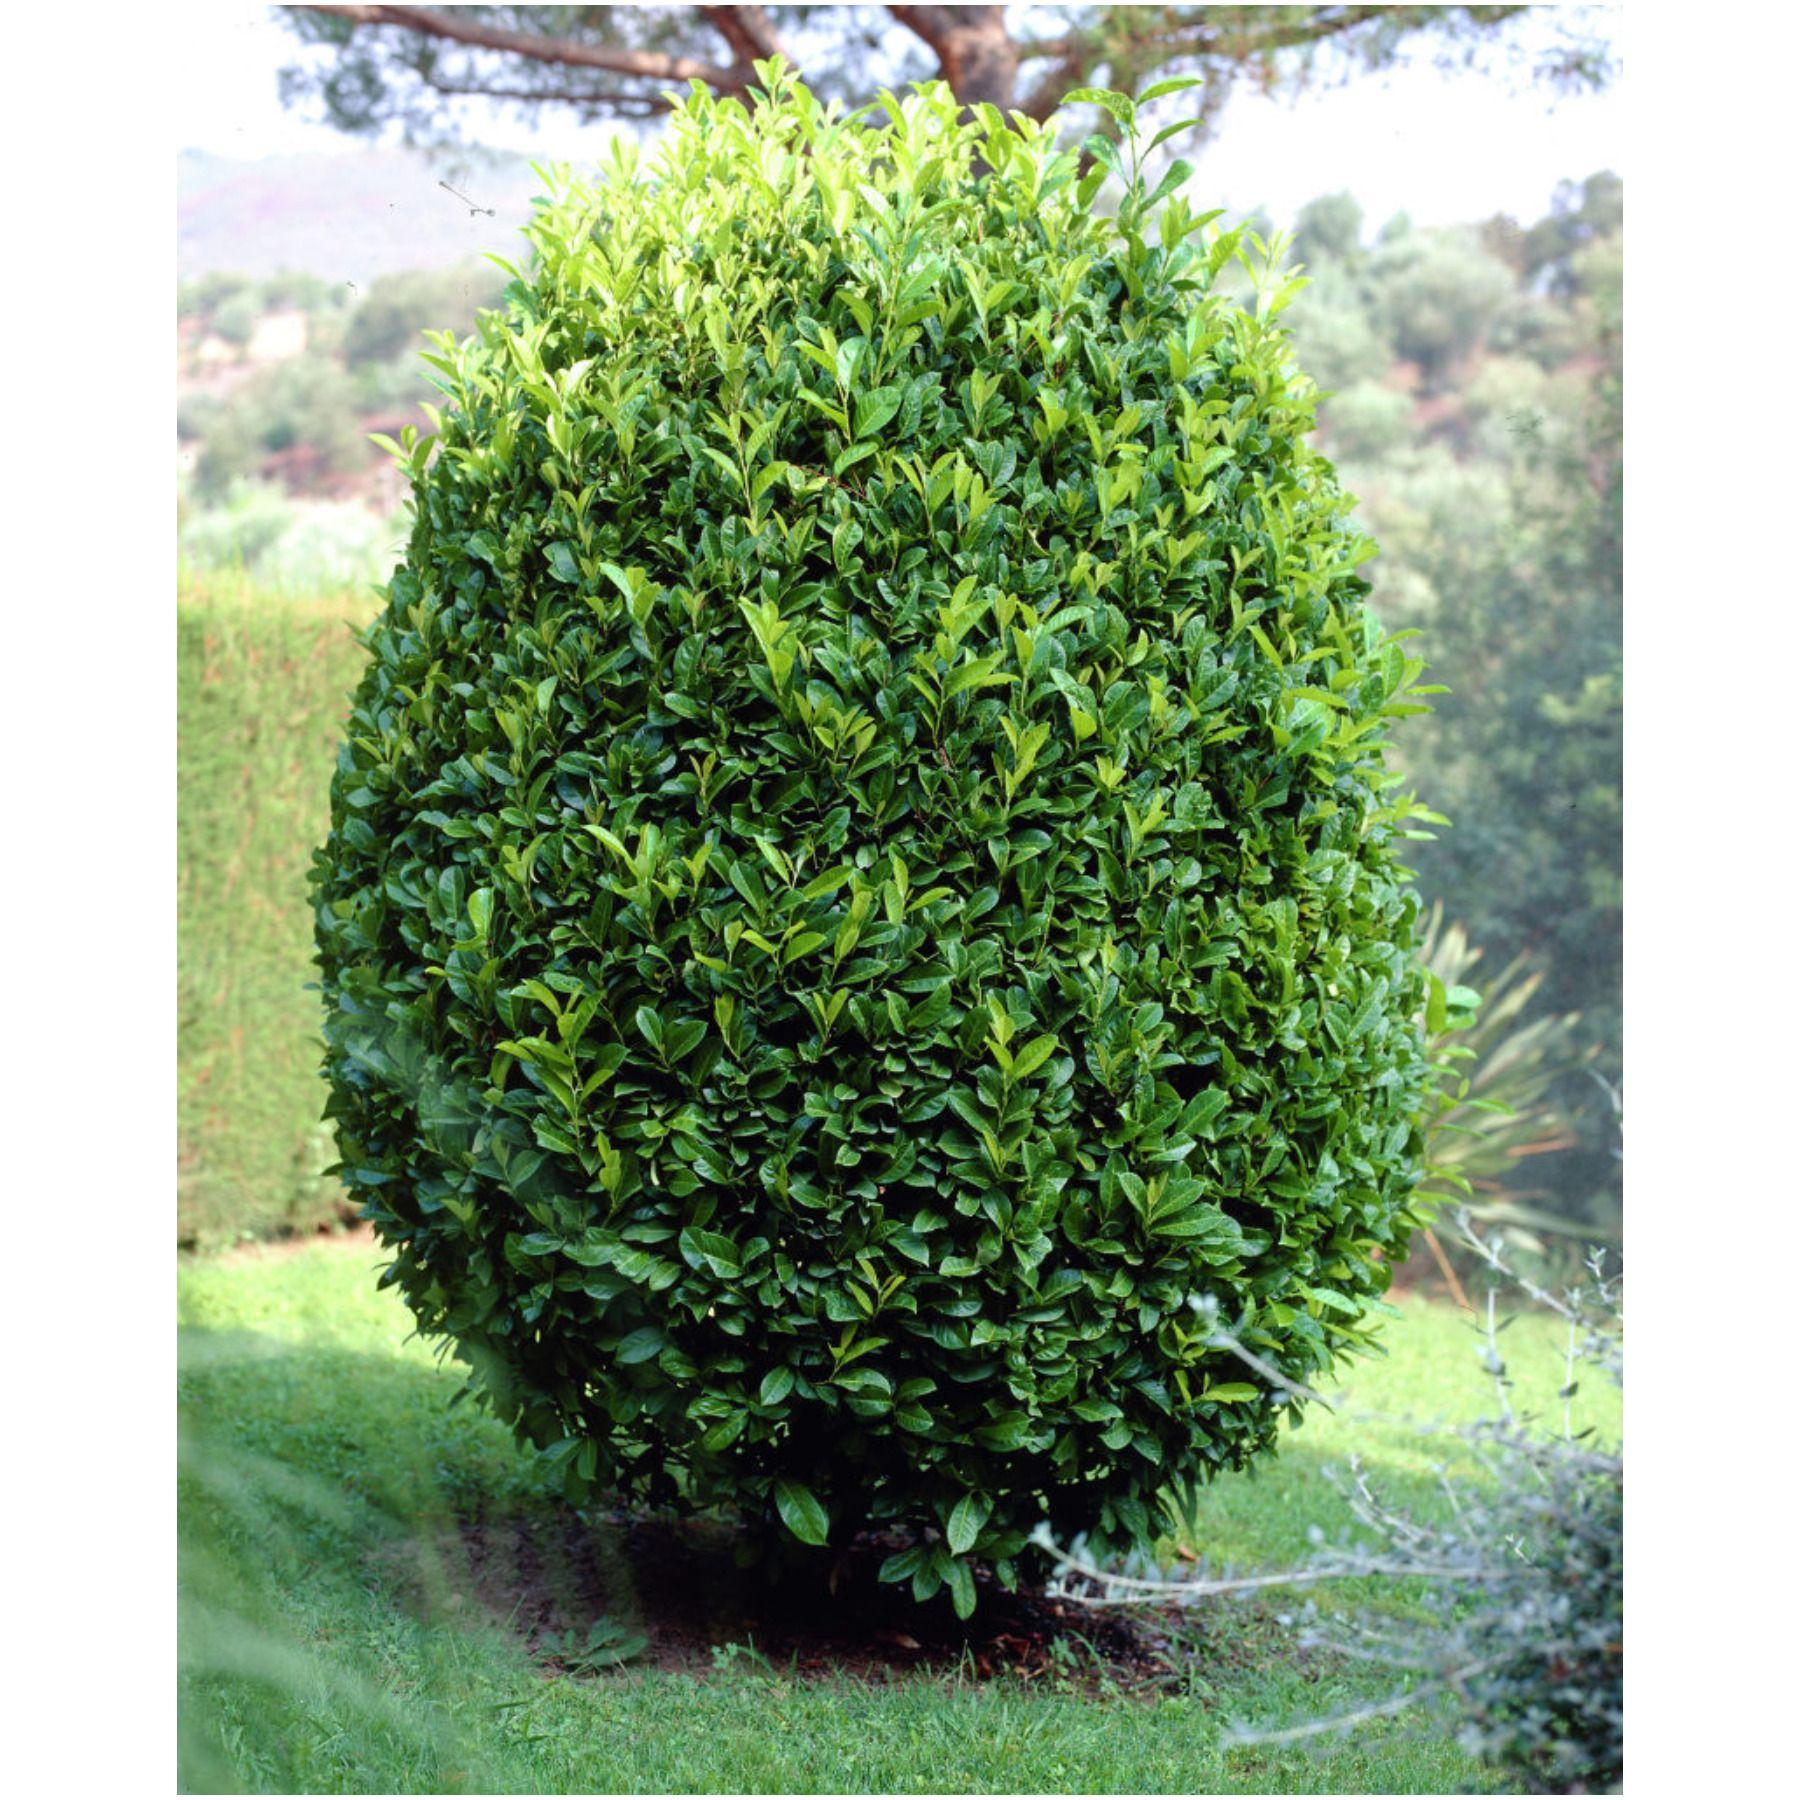 sweet bay laurus nobilis live plant fits 5 gallon pot. Black Bedroom Furniture Sets. Home Design Ideas